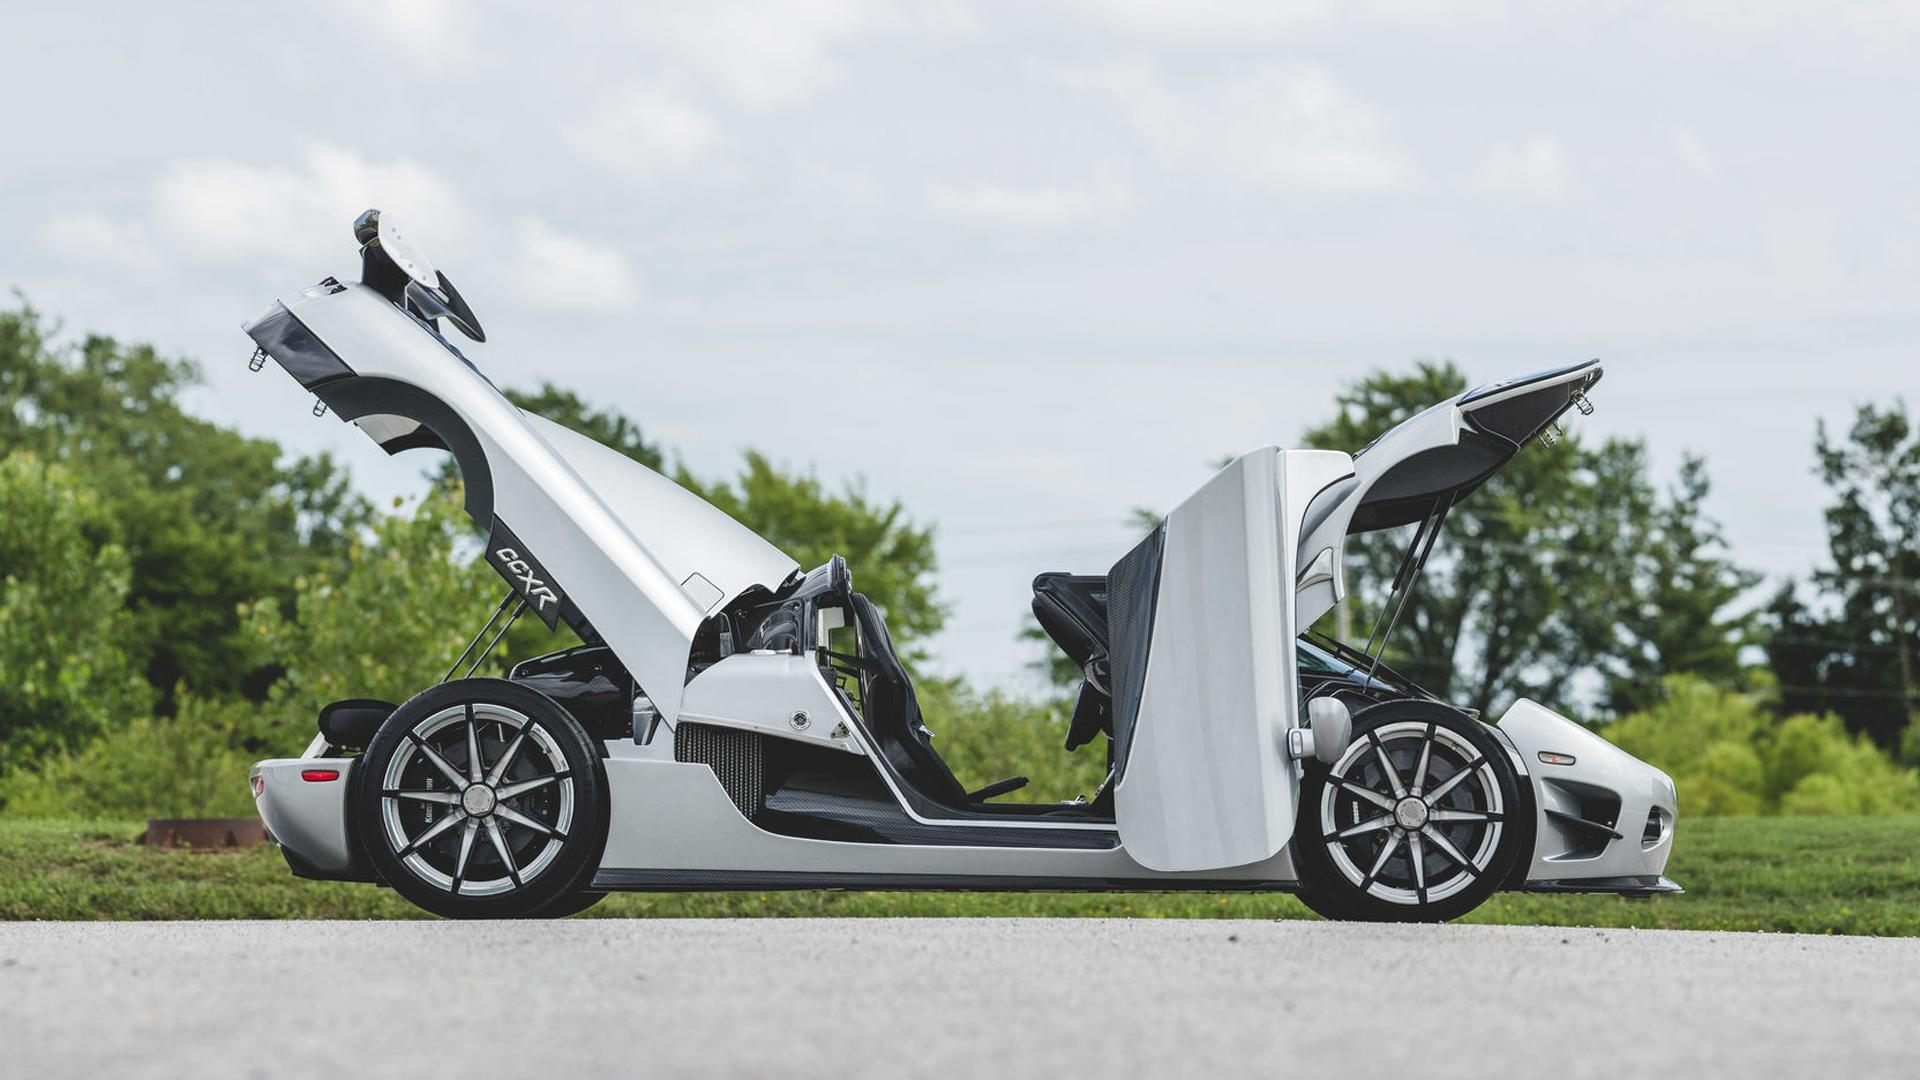 Koenigsegg Ccxr Trevita >> Floyd Mayweather S Koenigsegg Ccxr Trevita Up For Auction